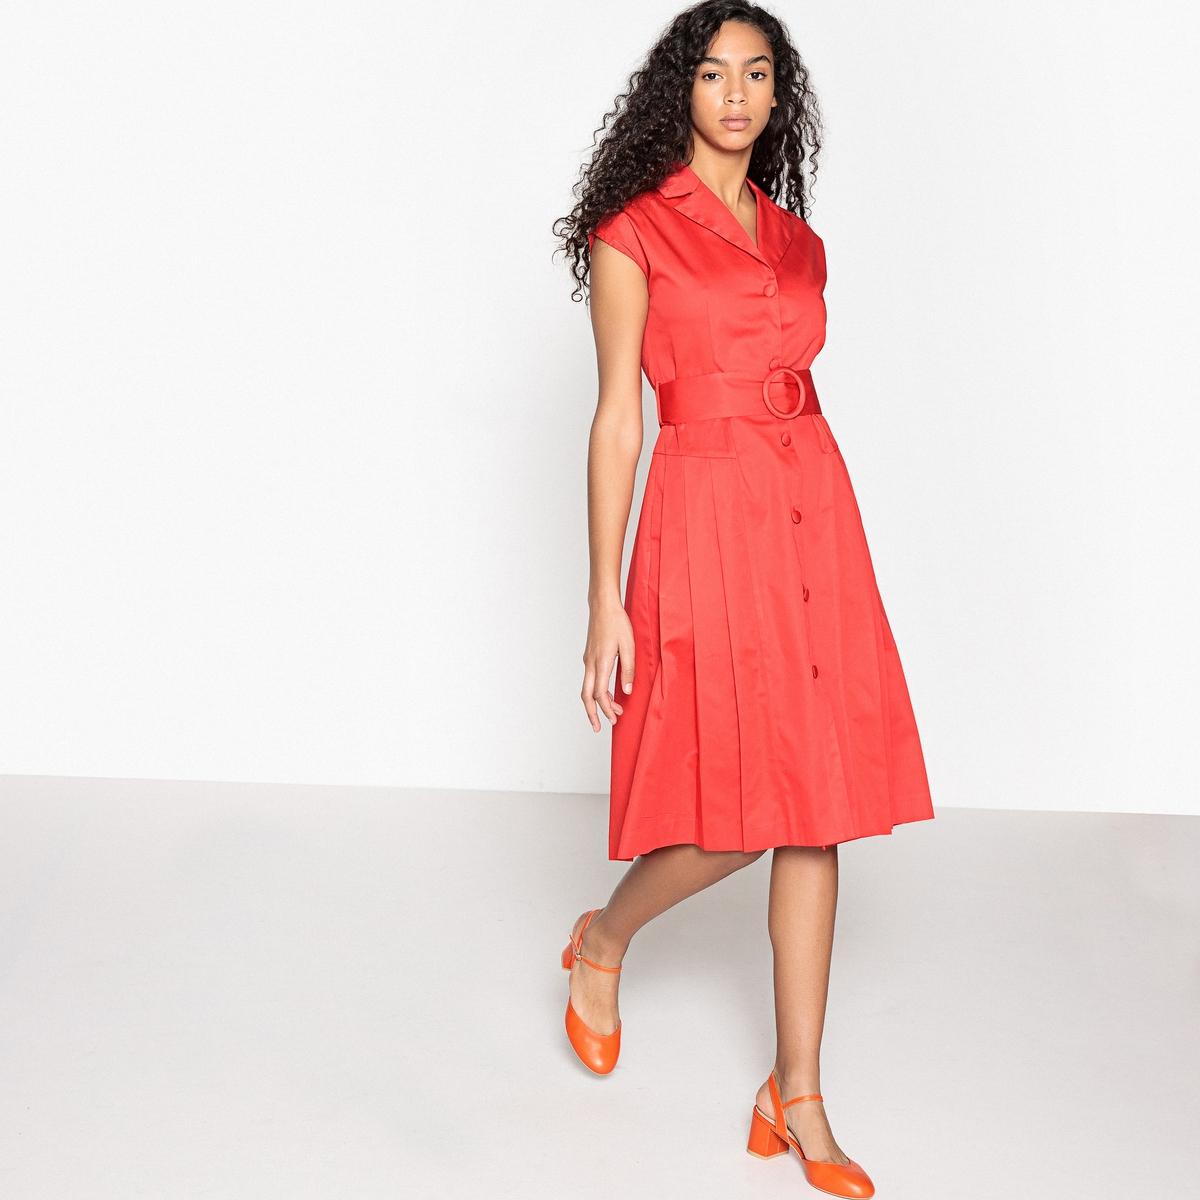 Платье-рубашка с поясом в духе 50-х годов коулмен хокинс каунт бэйси дюк эллингтон рассел смит флетчер хендерсон dorsey brothers джаз 30 х годов mp3